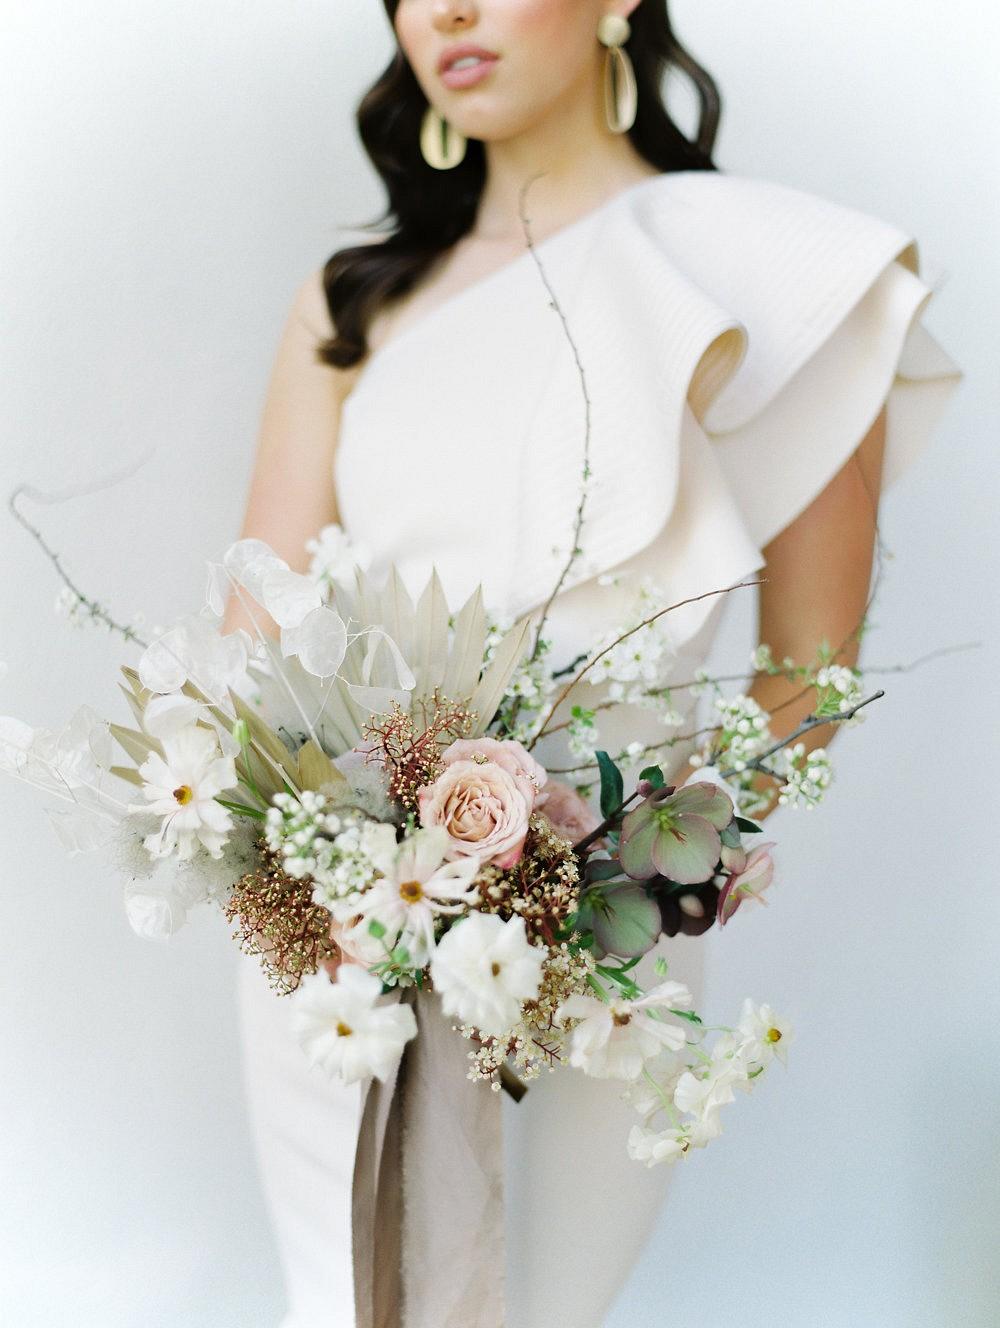 Modern & Minimalist wedding ideas for the fine art bride